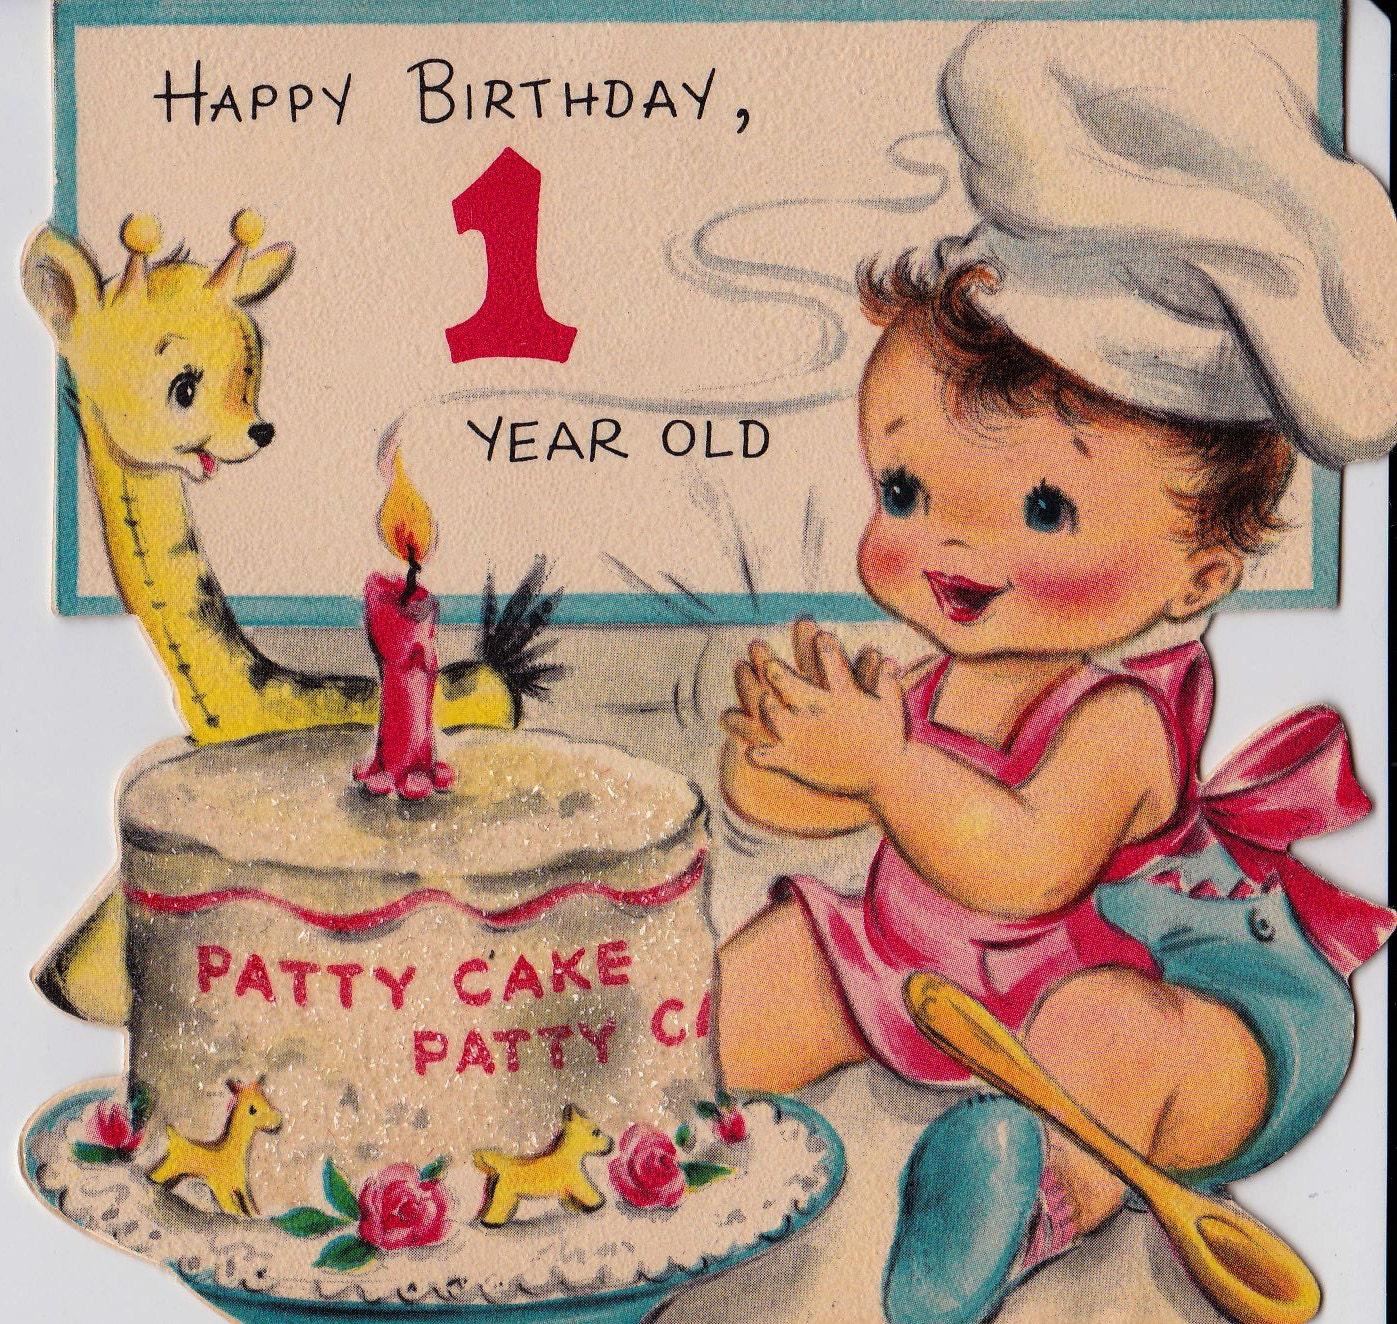 Vintage Hallmark 1950 Happy Birthday 1 Year Old Greetings Card